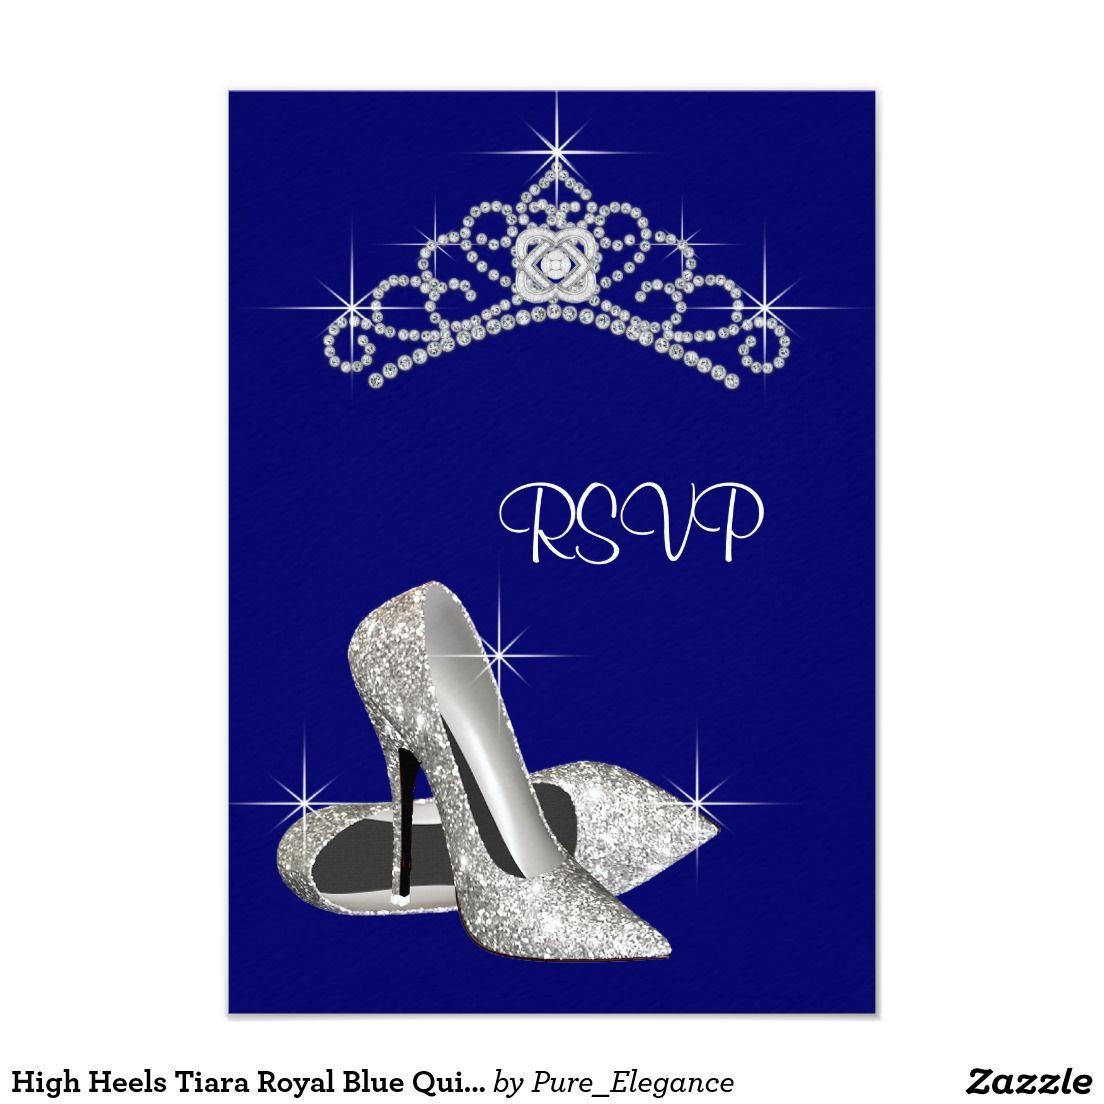 High heels tiara royal blue quinceanera rsvp card rsvp and high heels tiara royal blue quinceanera rsvp 35x5 paper invitation card stopboris Choice Image